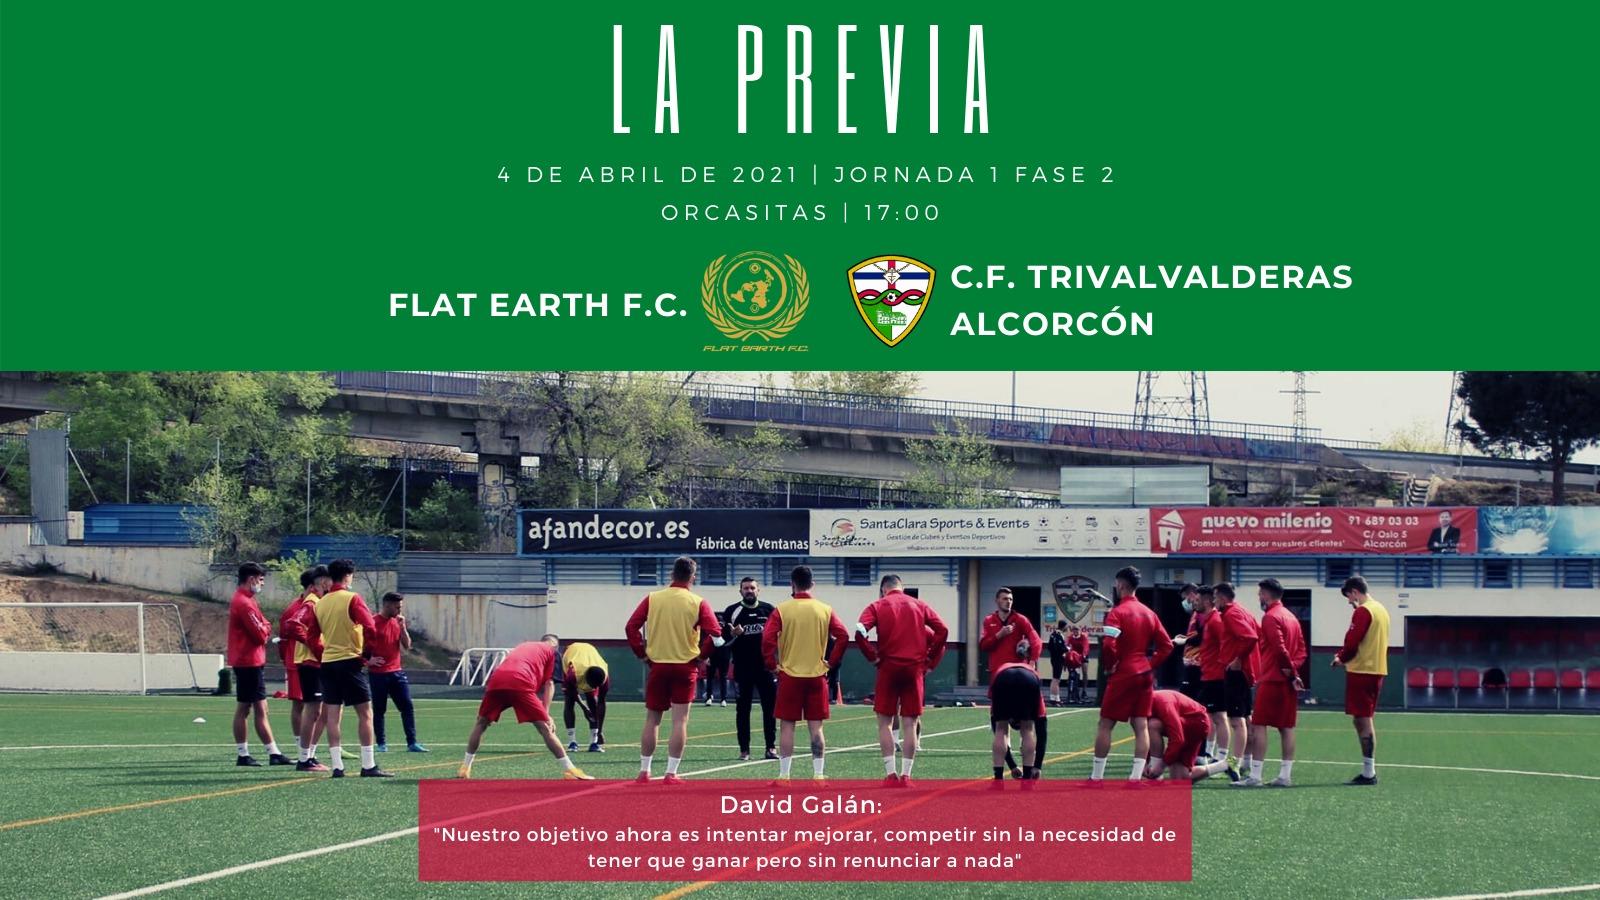 PREVIA J1 FASE 2| Flat Earth F.C. - C.F. TrivalValderas Alcorcón